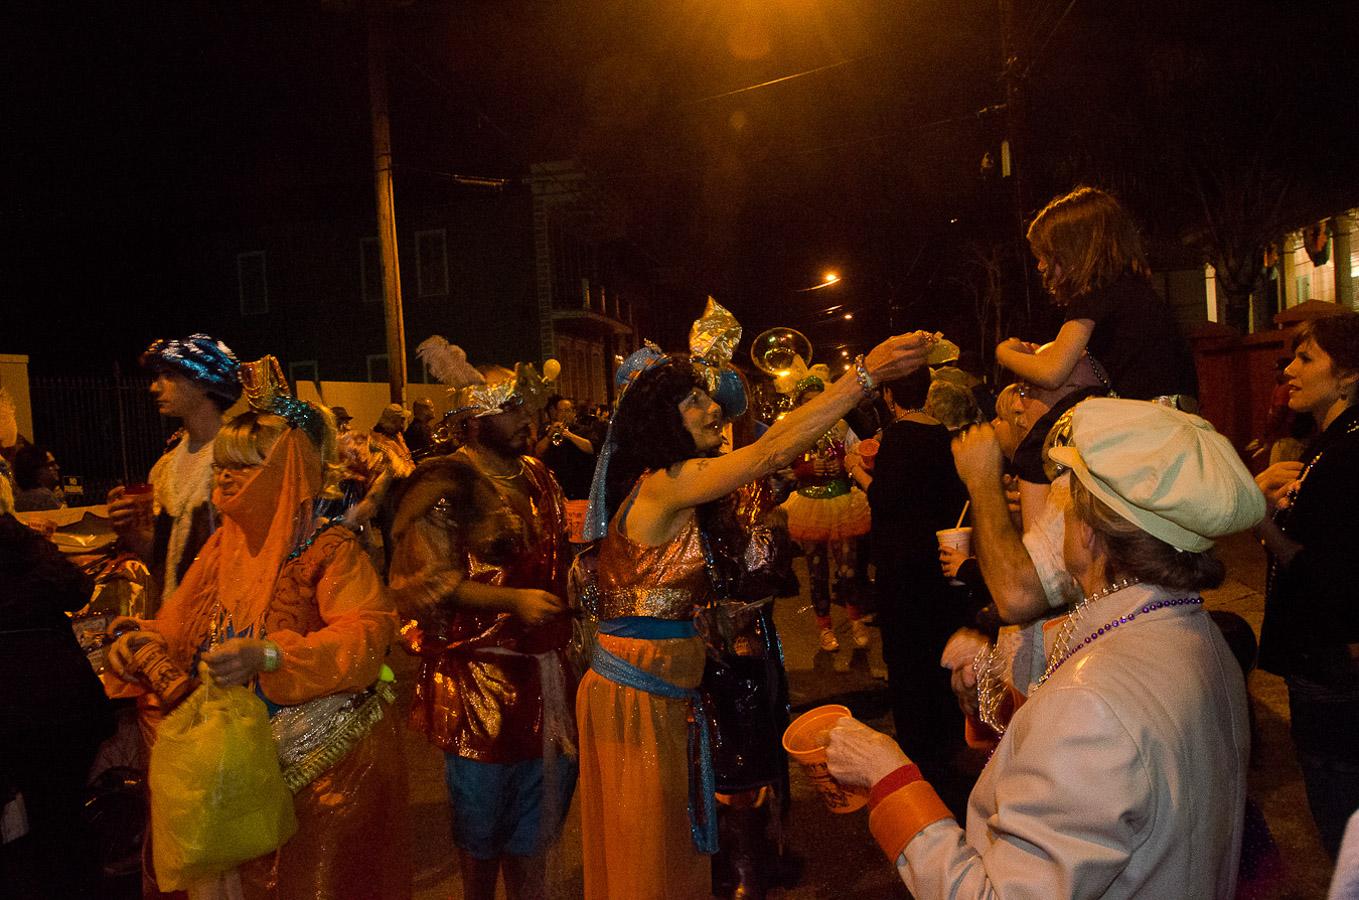 Krewe du Vieux Parade, Mardi Gras, New Orleans, Pam, 2012